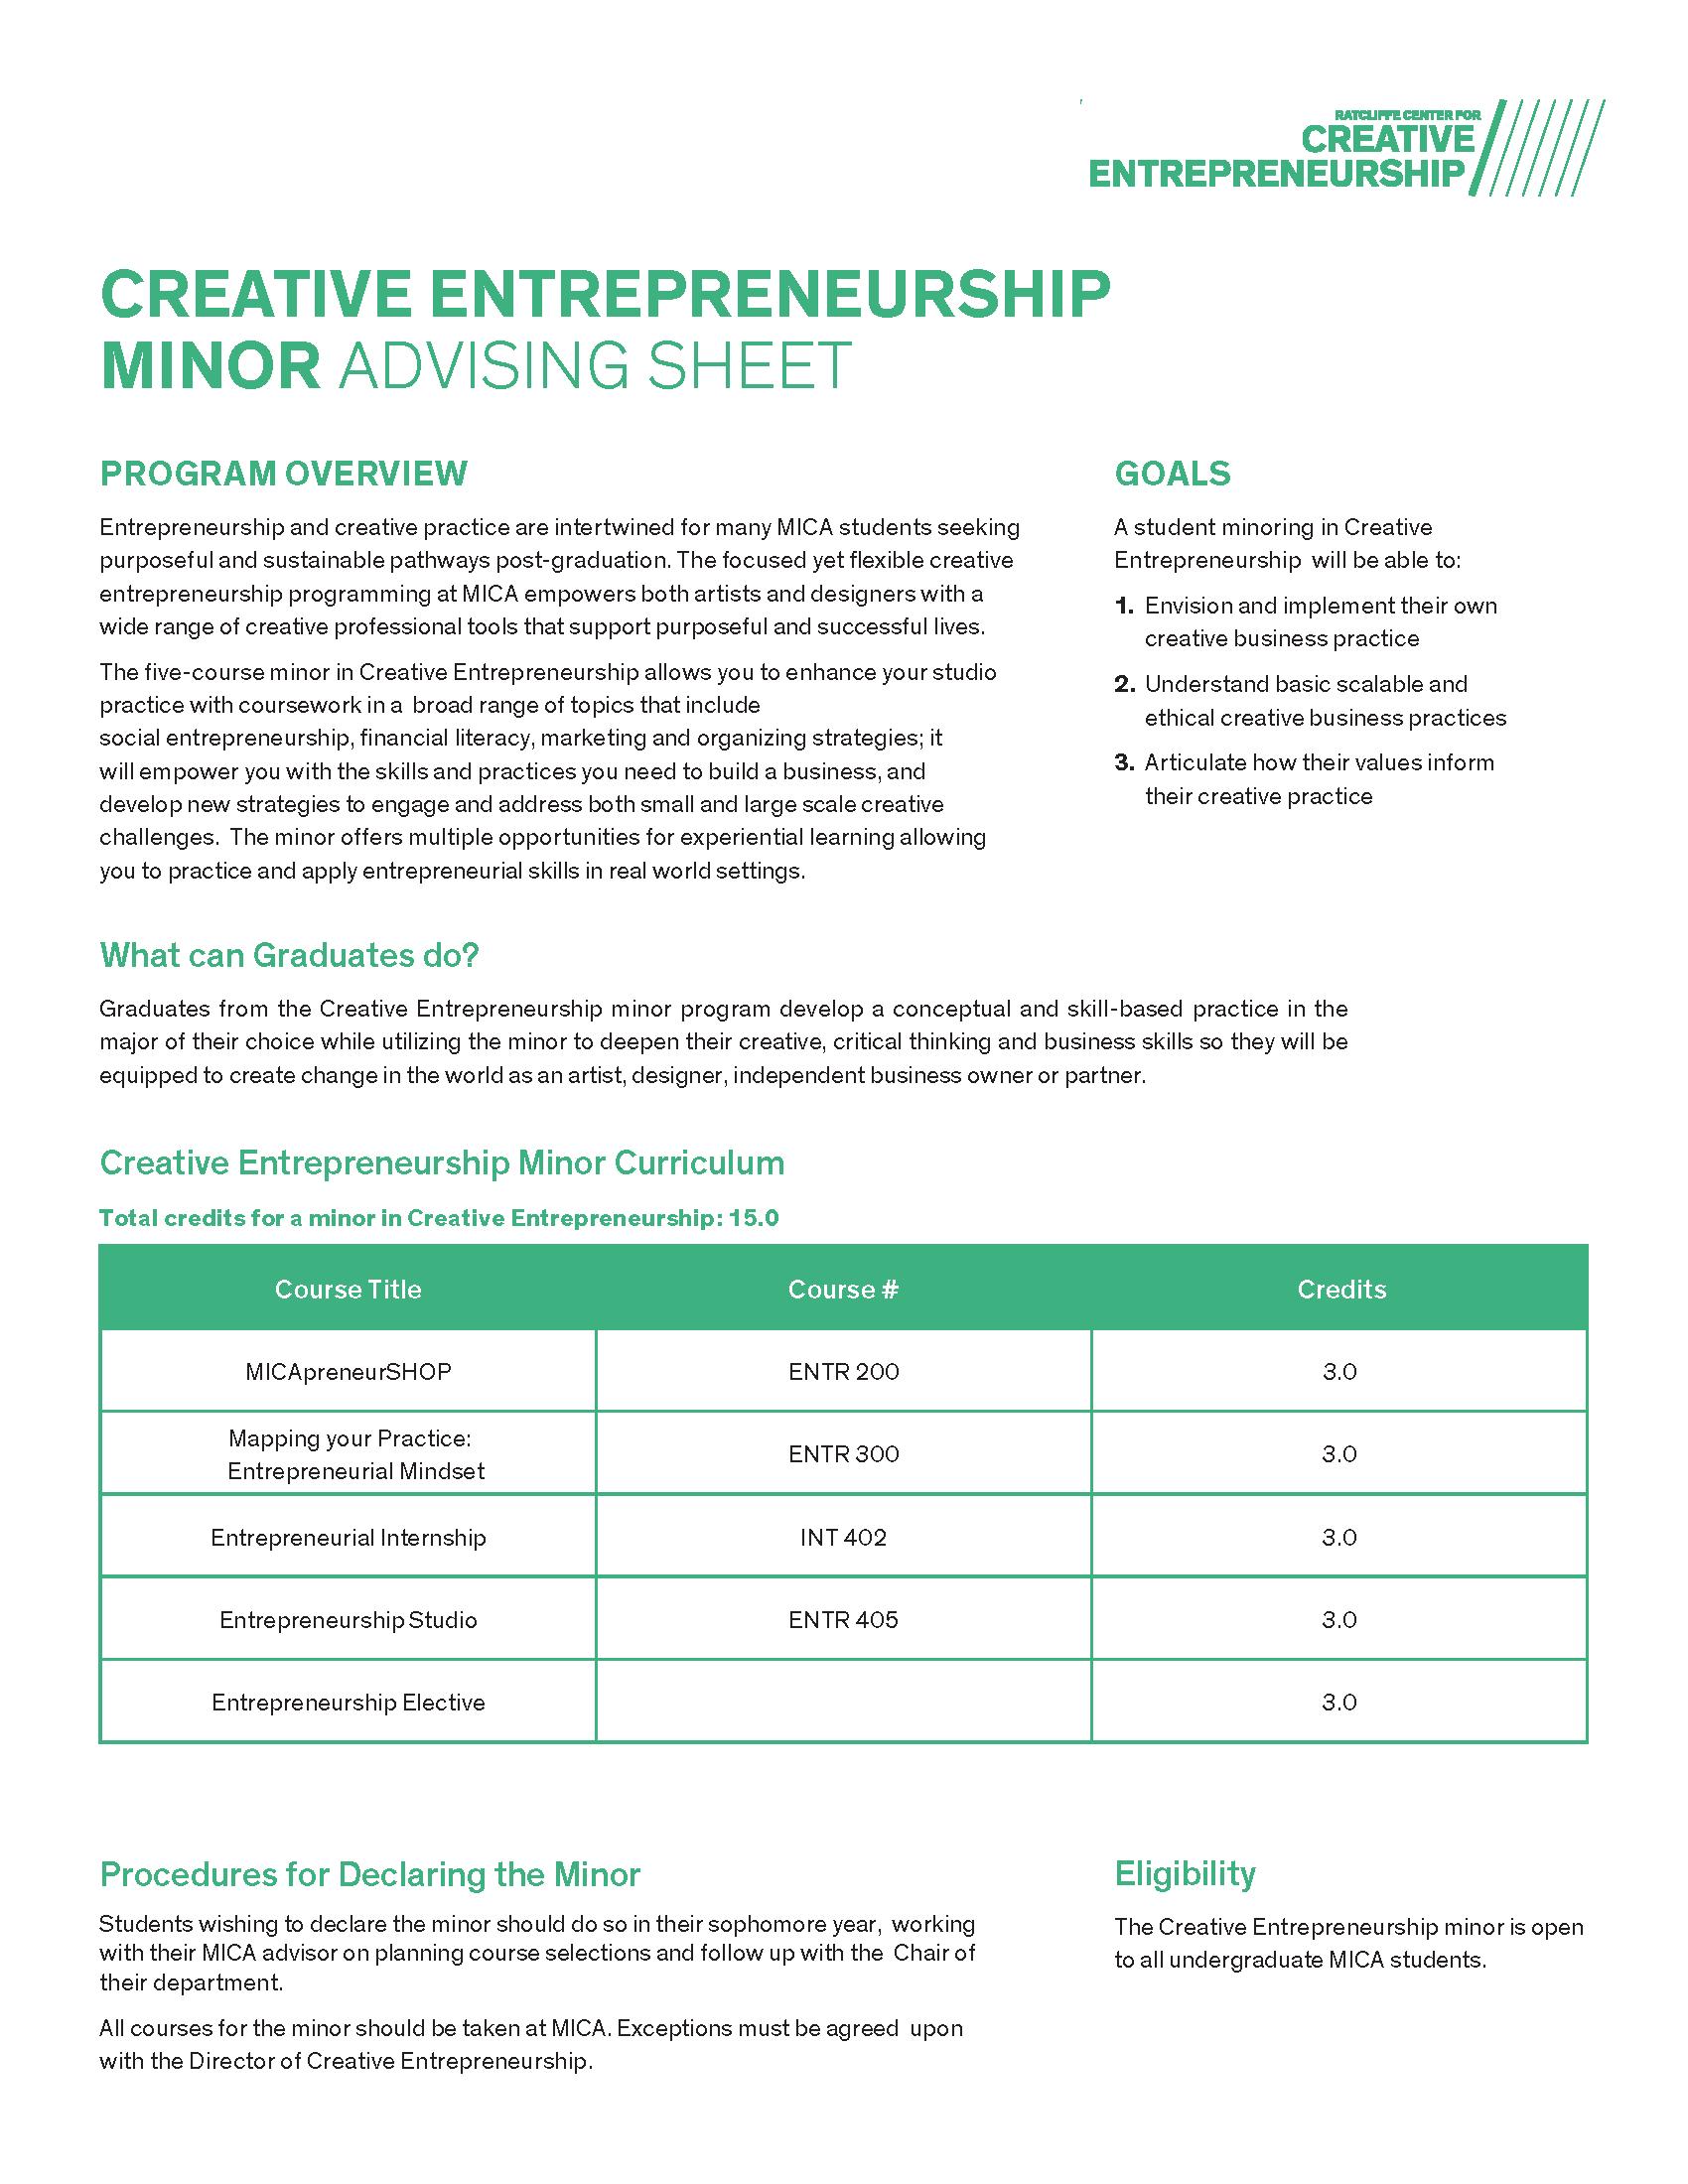 Creative Entrepreneurship Minor Advising Sheet